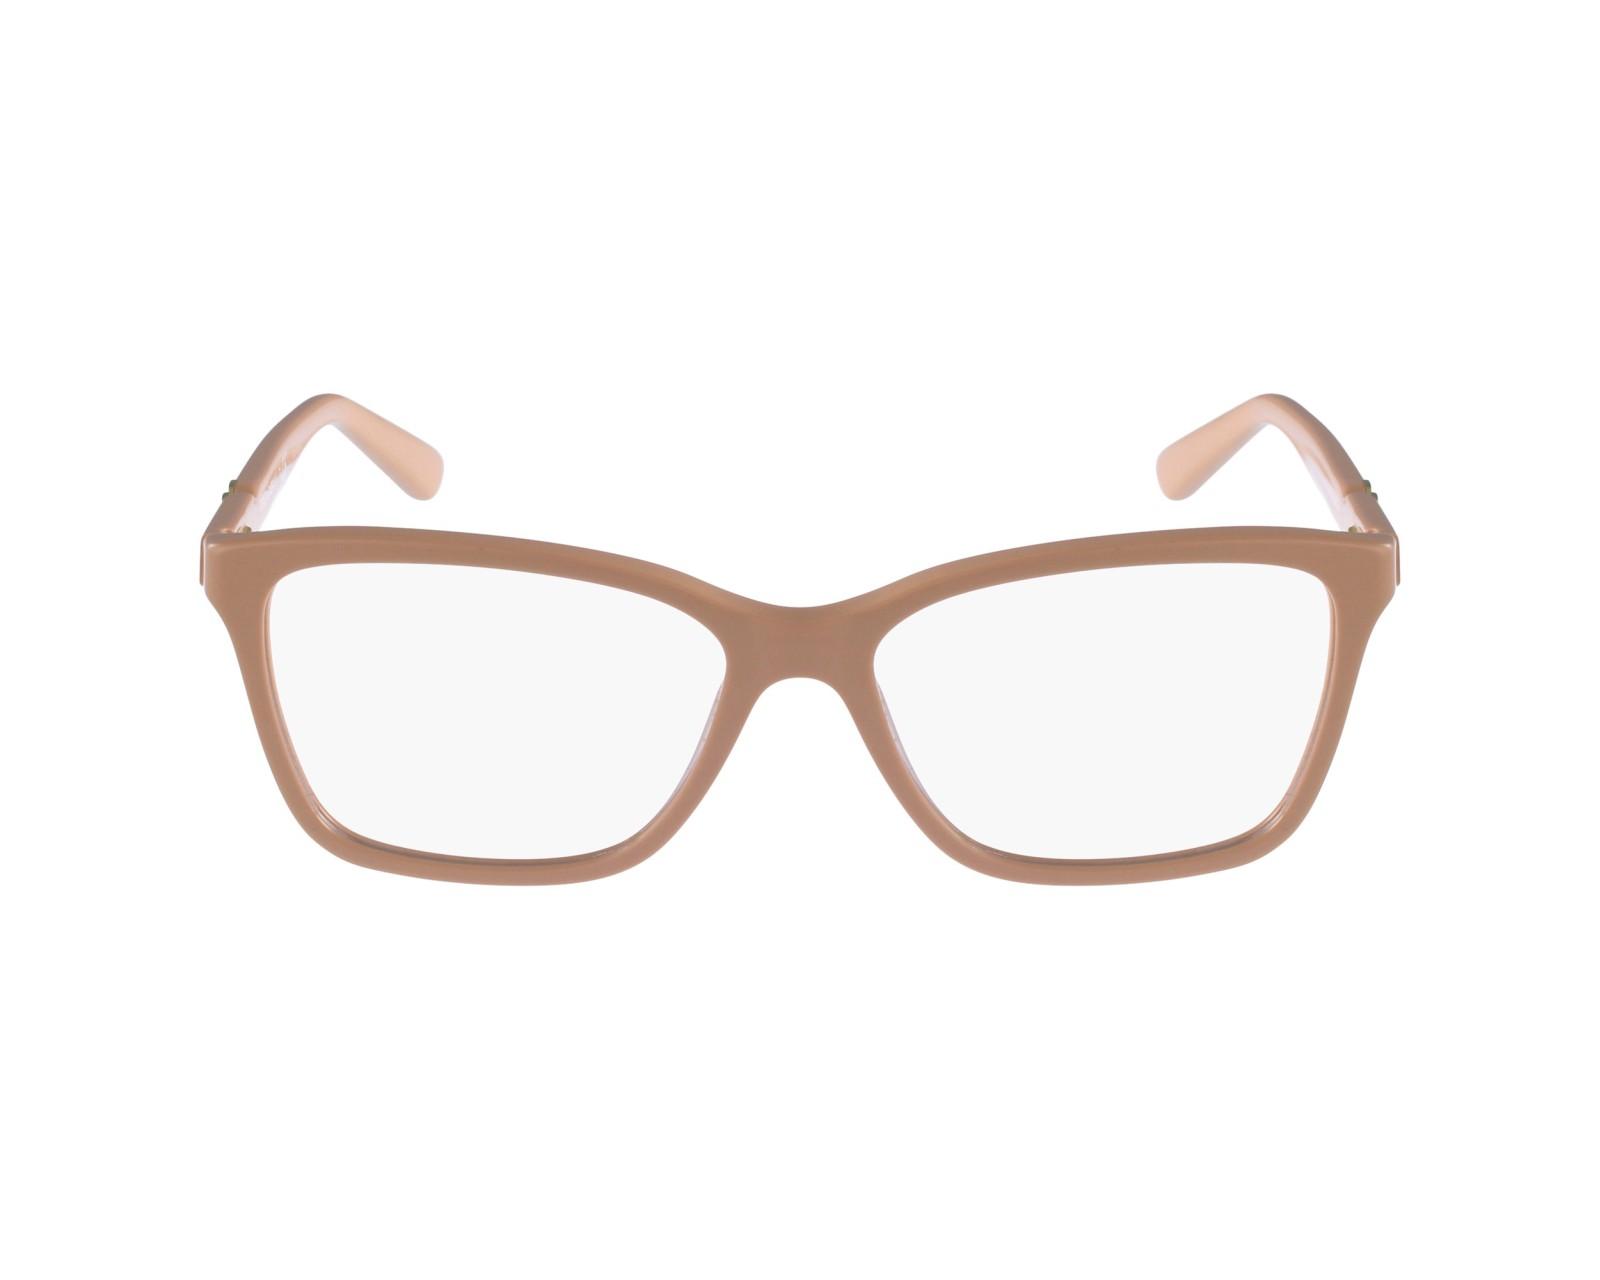 order your dolce gabbana eyeglasses dg 3153 pm 2585 54 today